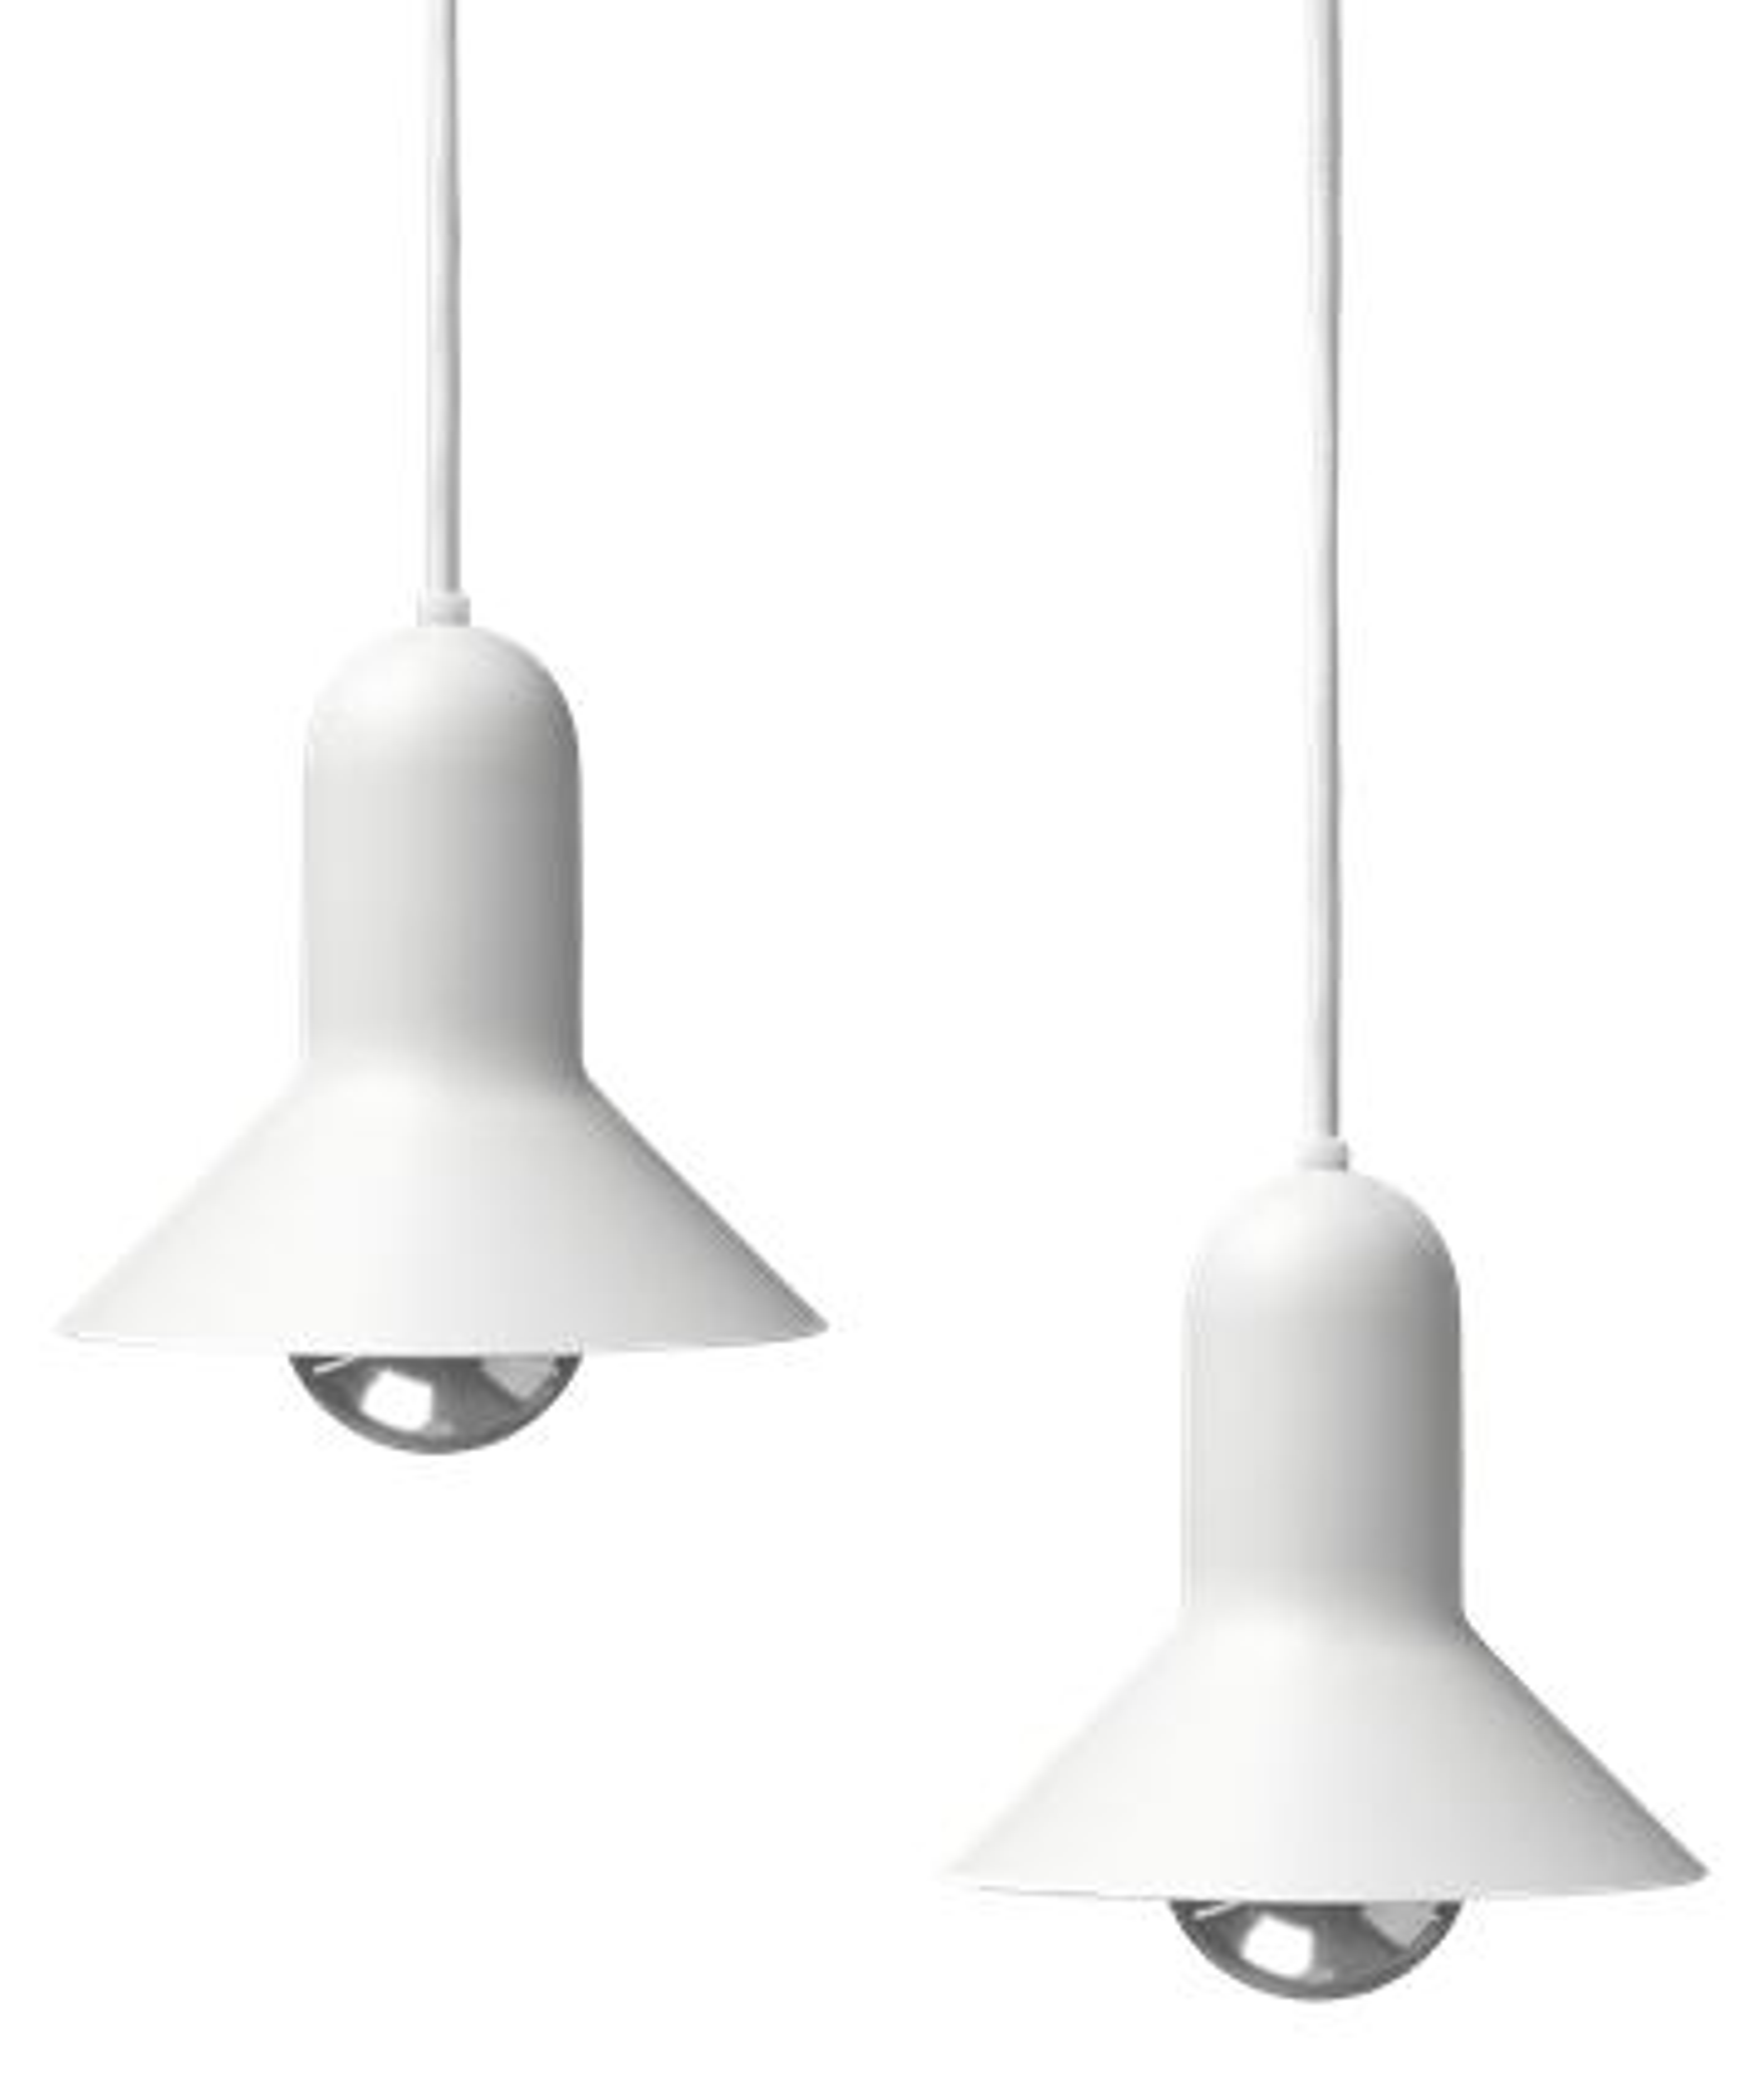 BT1091 | Confetti Pendants, 2 st.